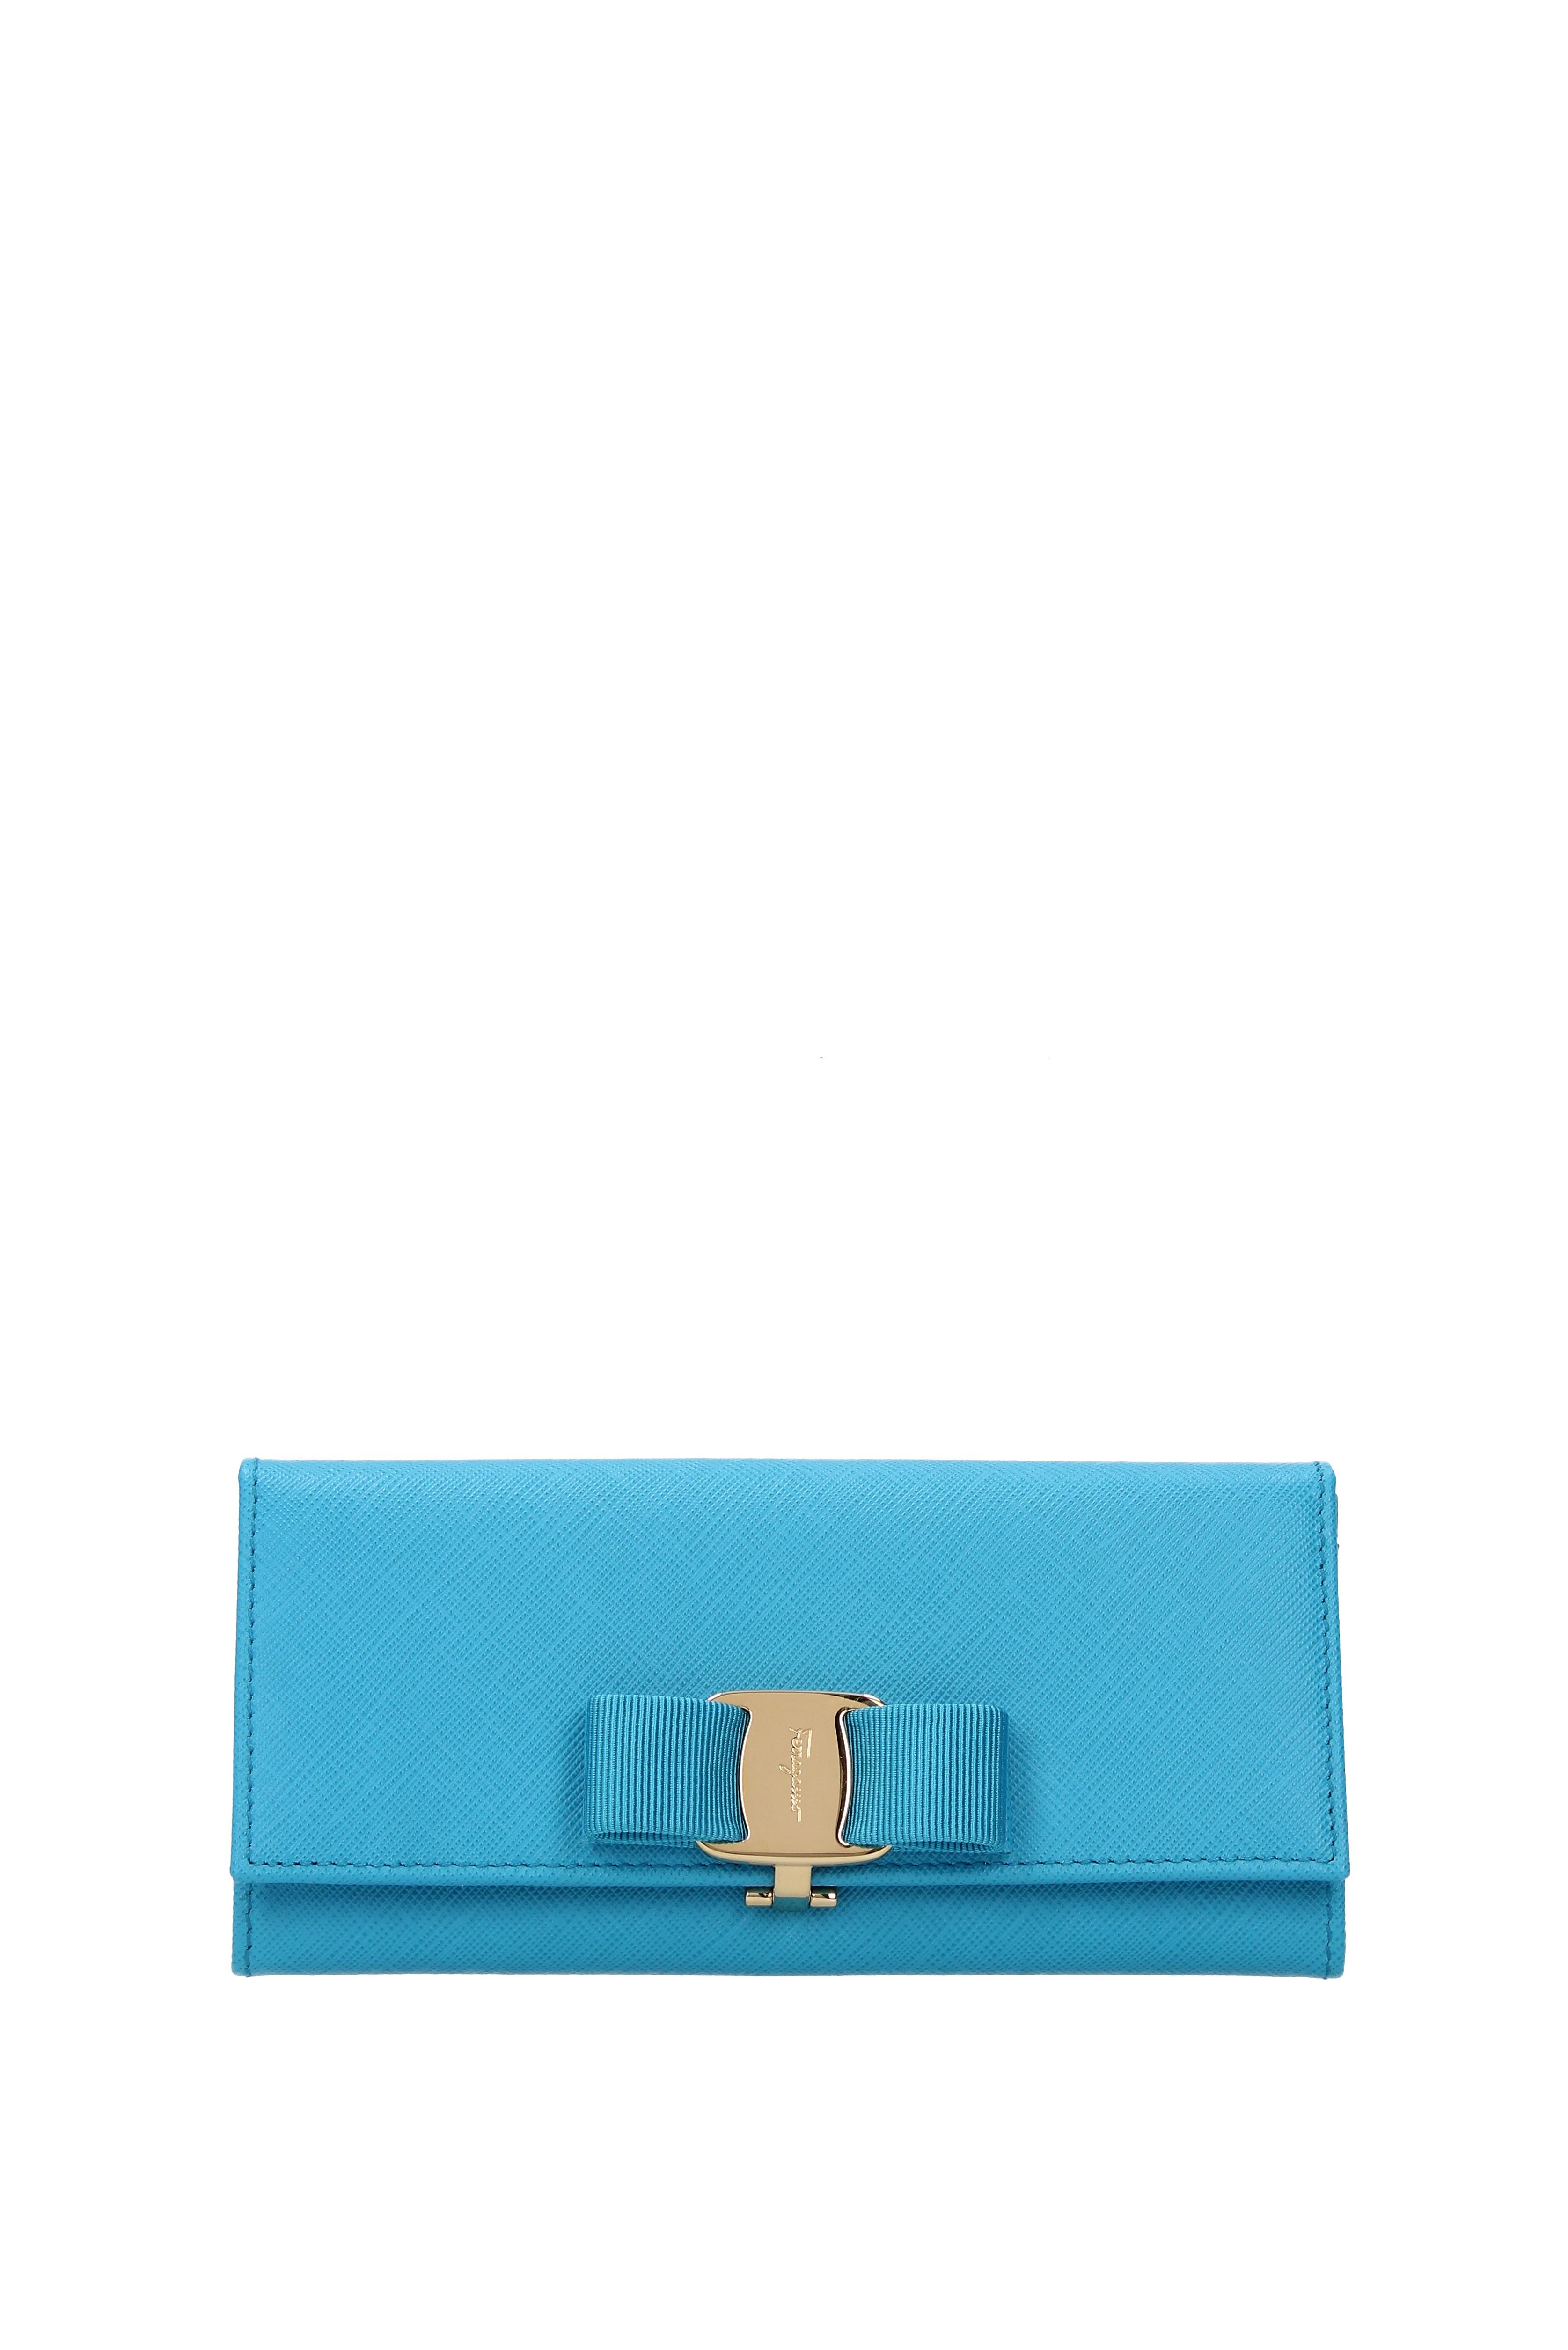 Brieftasche-Salvatore-Ferragamo-Damen-Leder-22B55906595